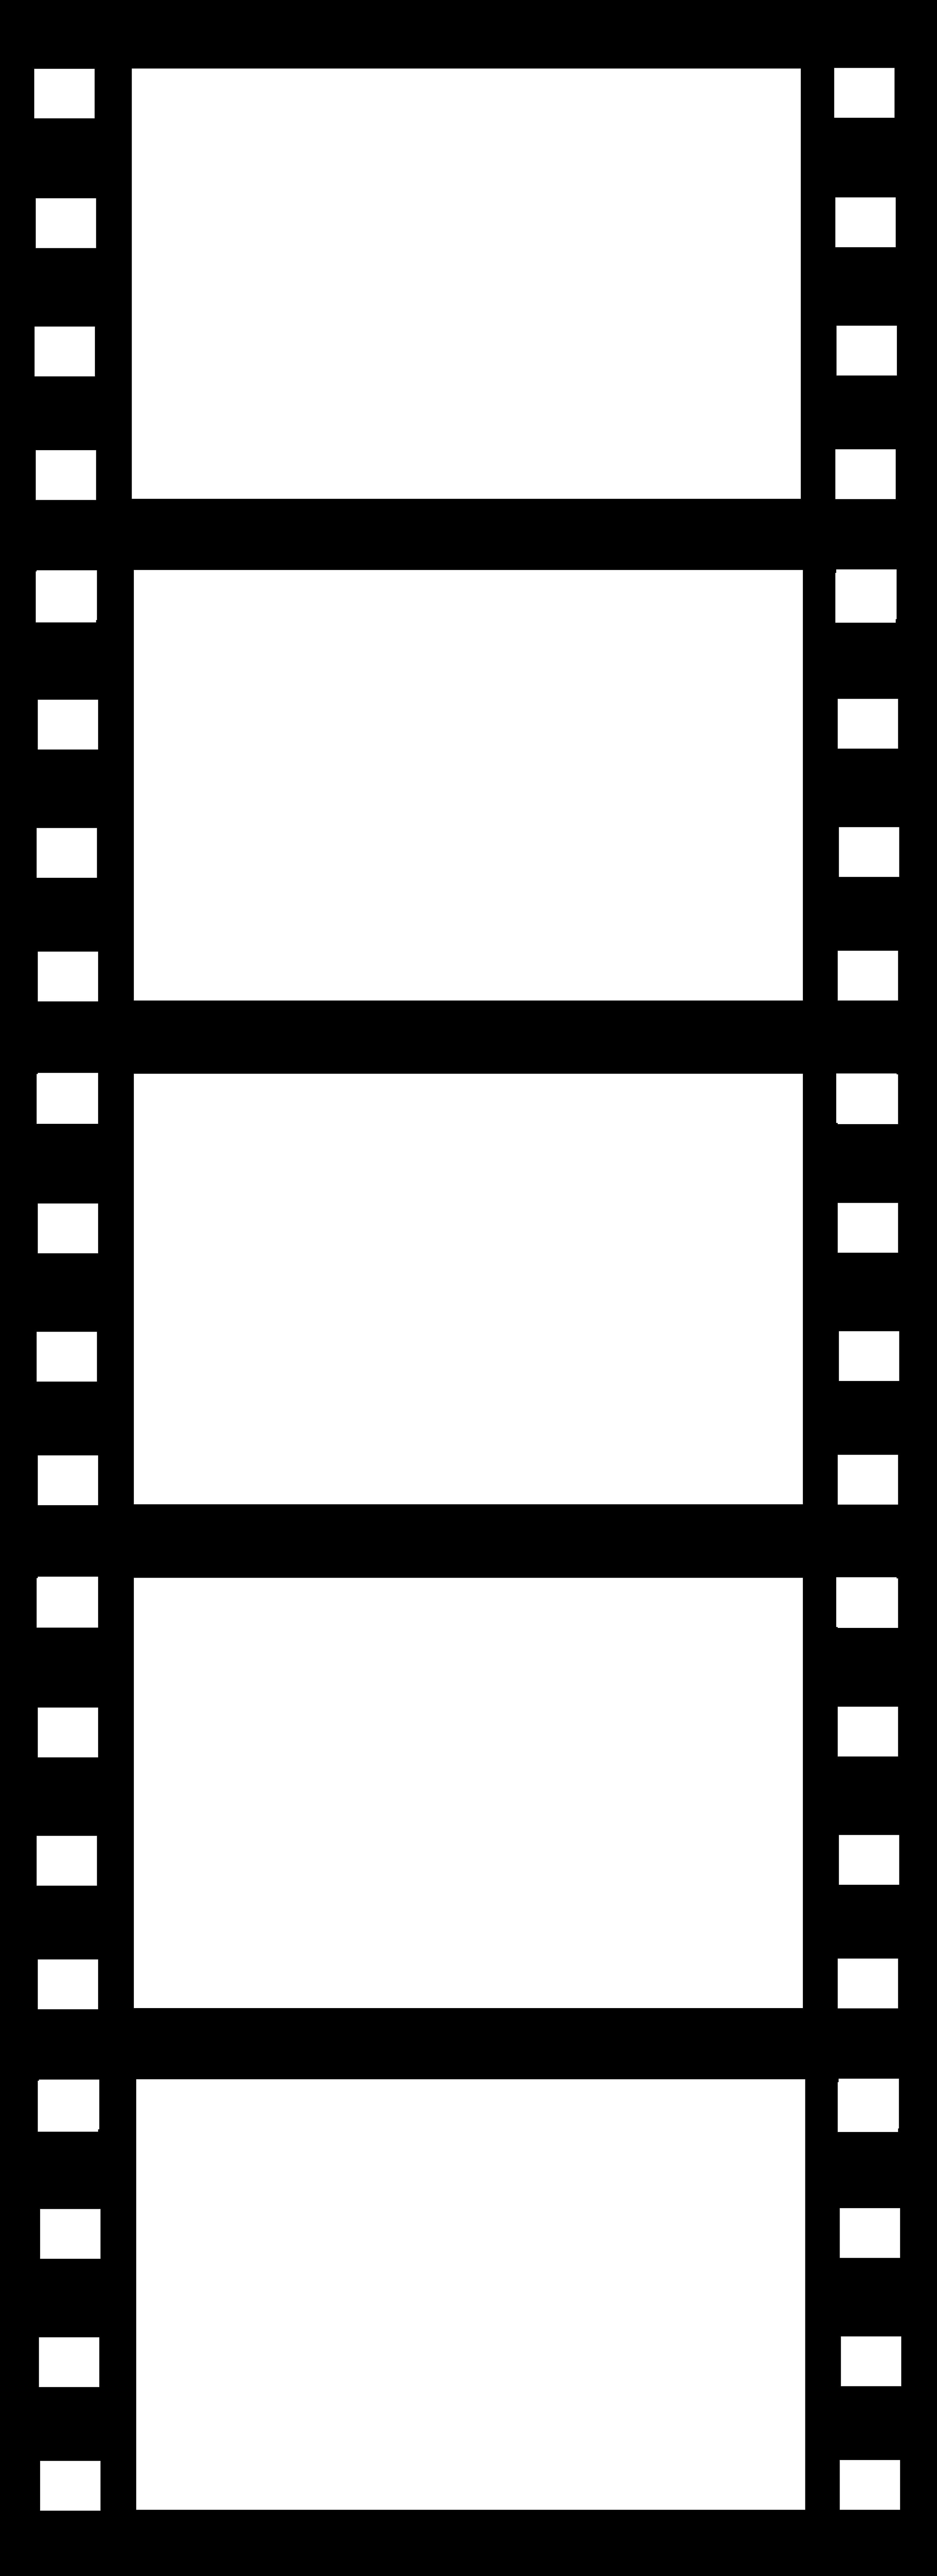 Film Strip: Microsoft Film Strip Clipart 20 Free Cliparts